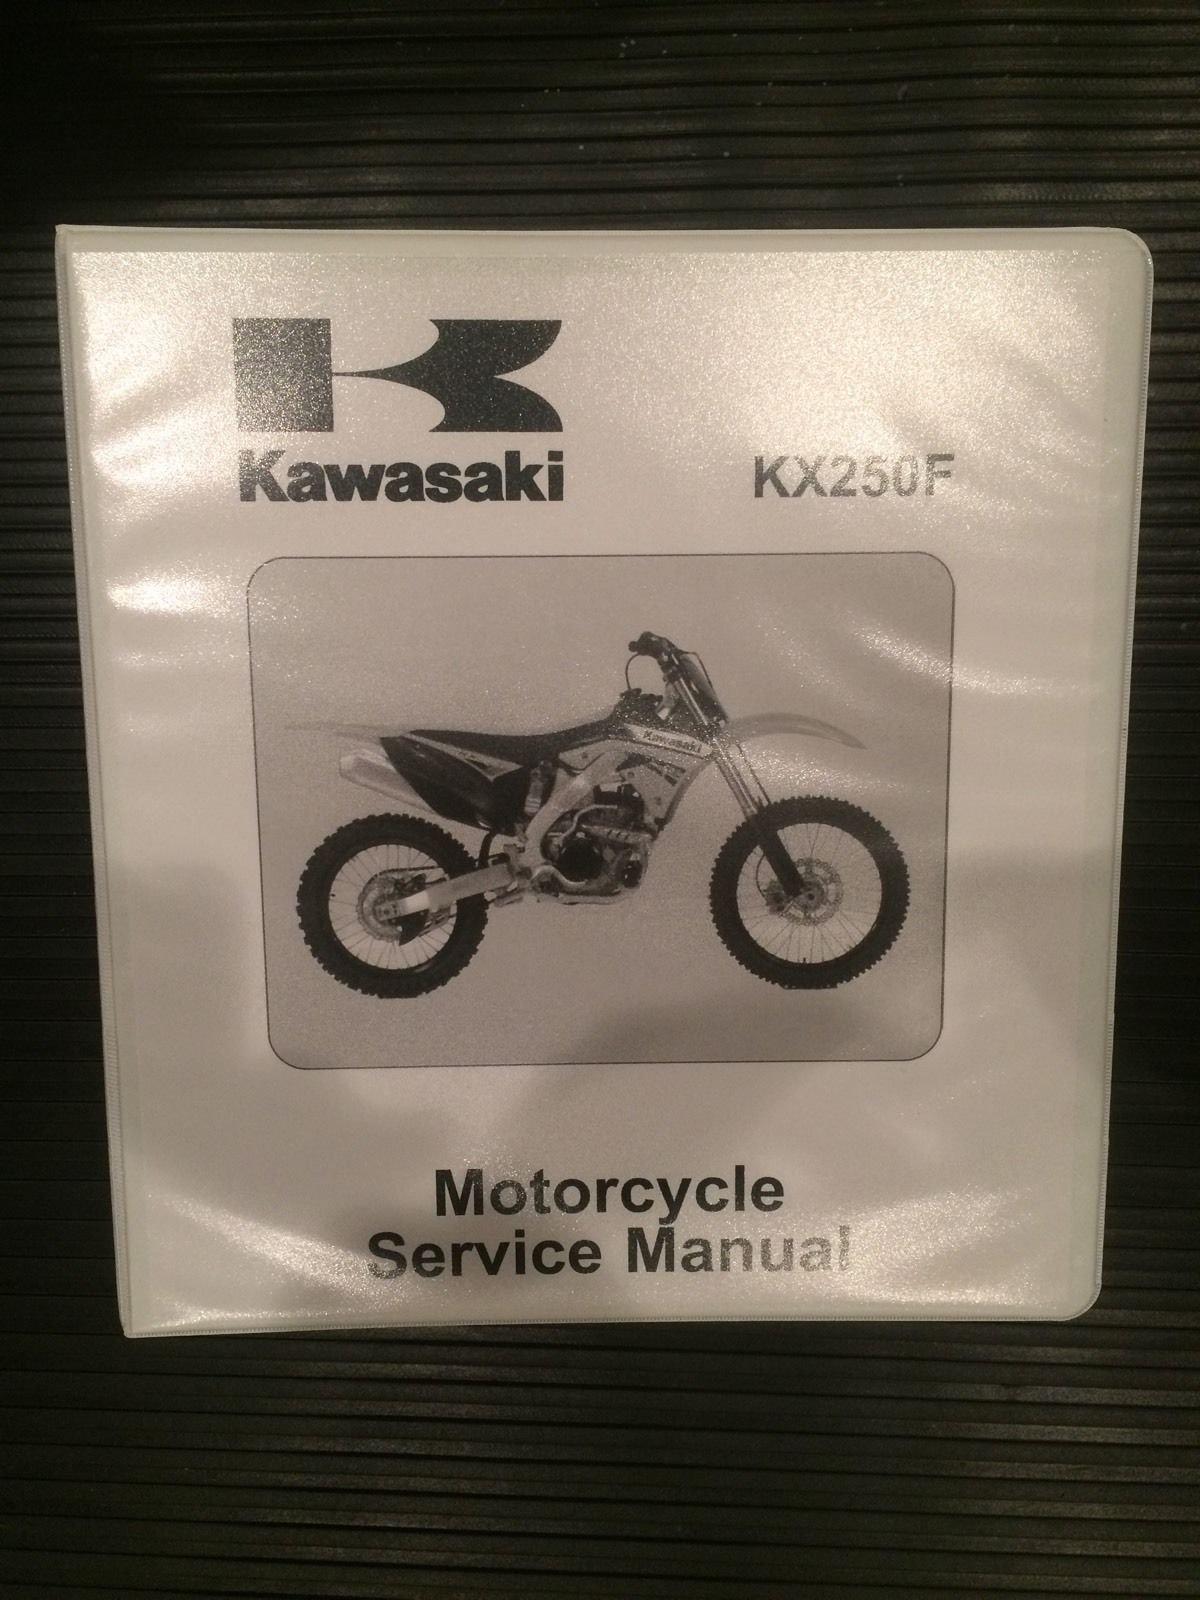 Cheap kawasaki repair manual pdf find kawasaki repair manual pdf get quotations kawasaki 2011 2012 kx250f service repair manual book service fandeluxe Gallery